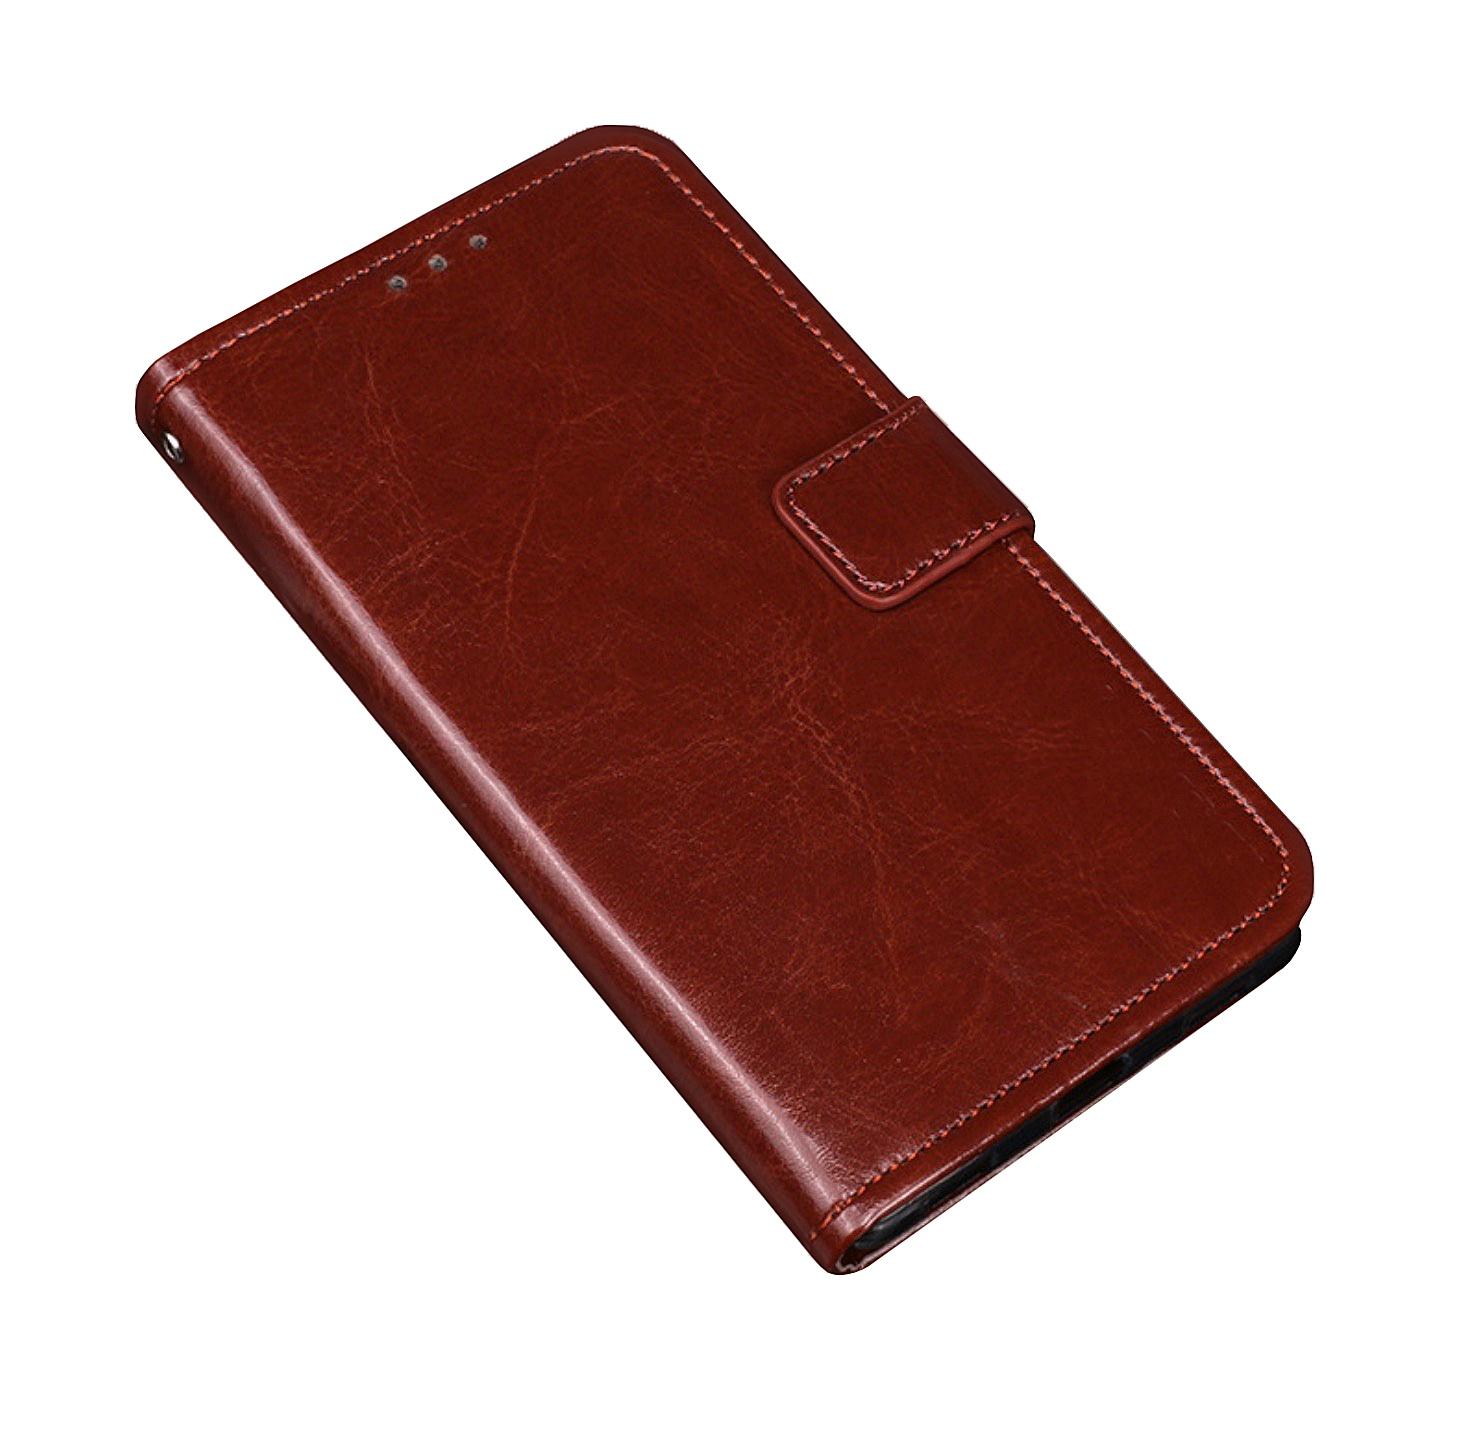 Чехол-книжка MyPads для BQ Mobile BQ-5201 Space с мульти-подставкой застёжкой и визитницей коричневый